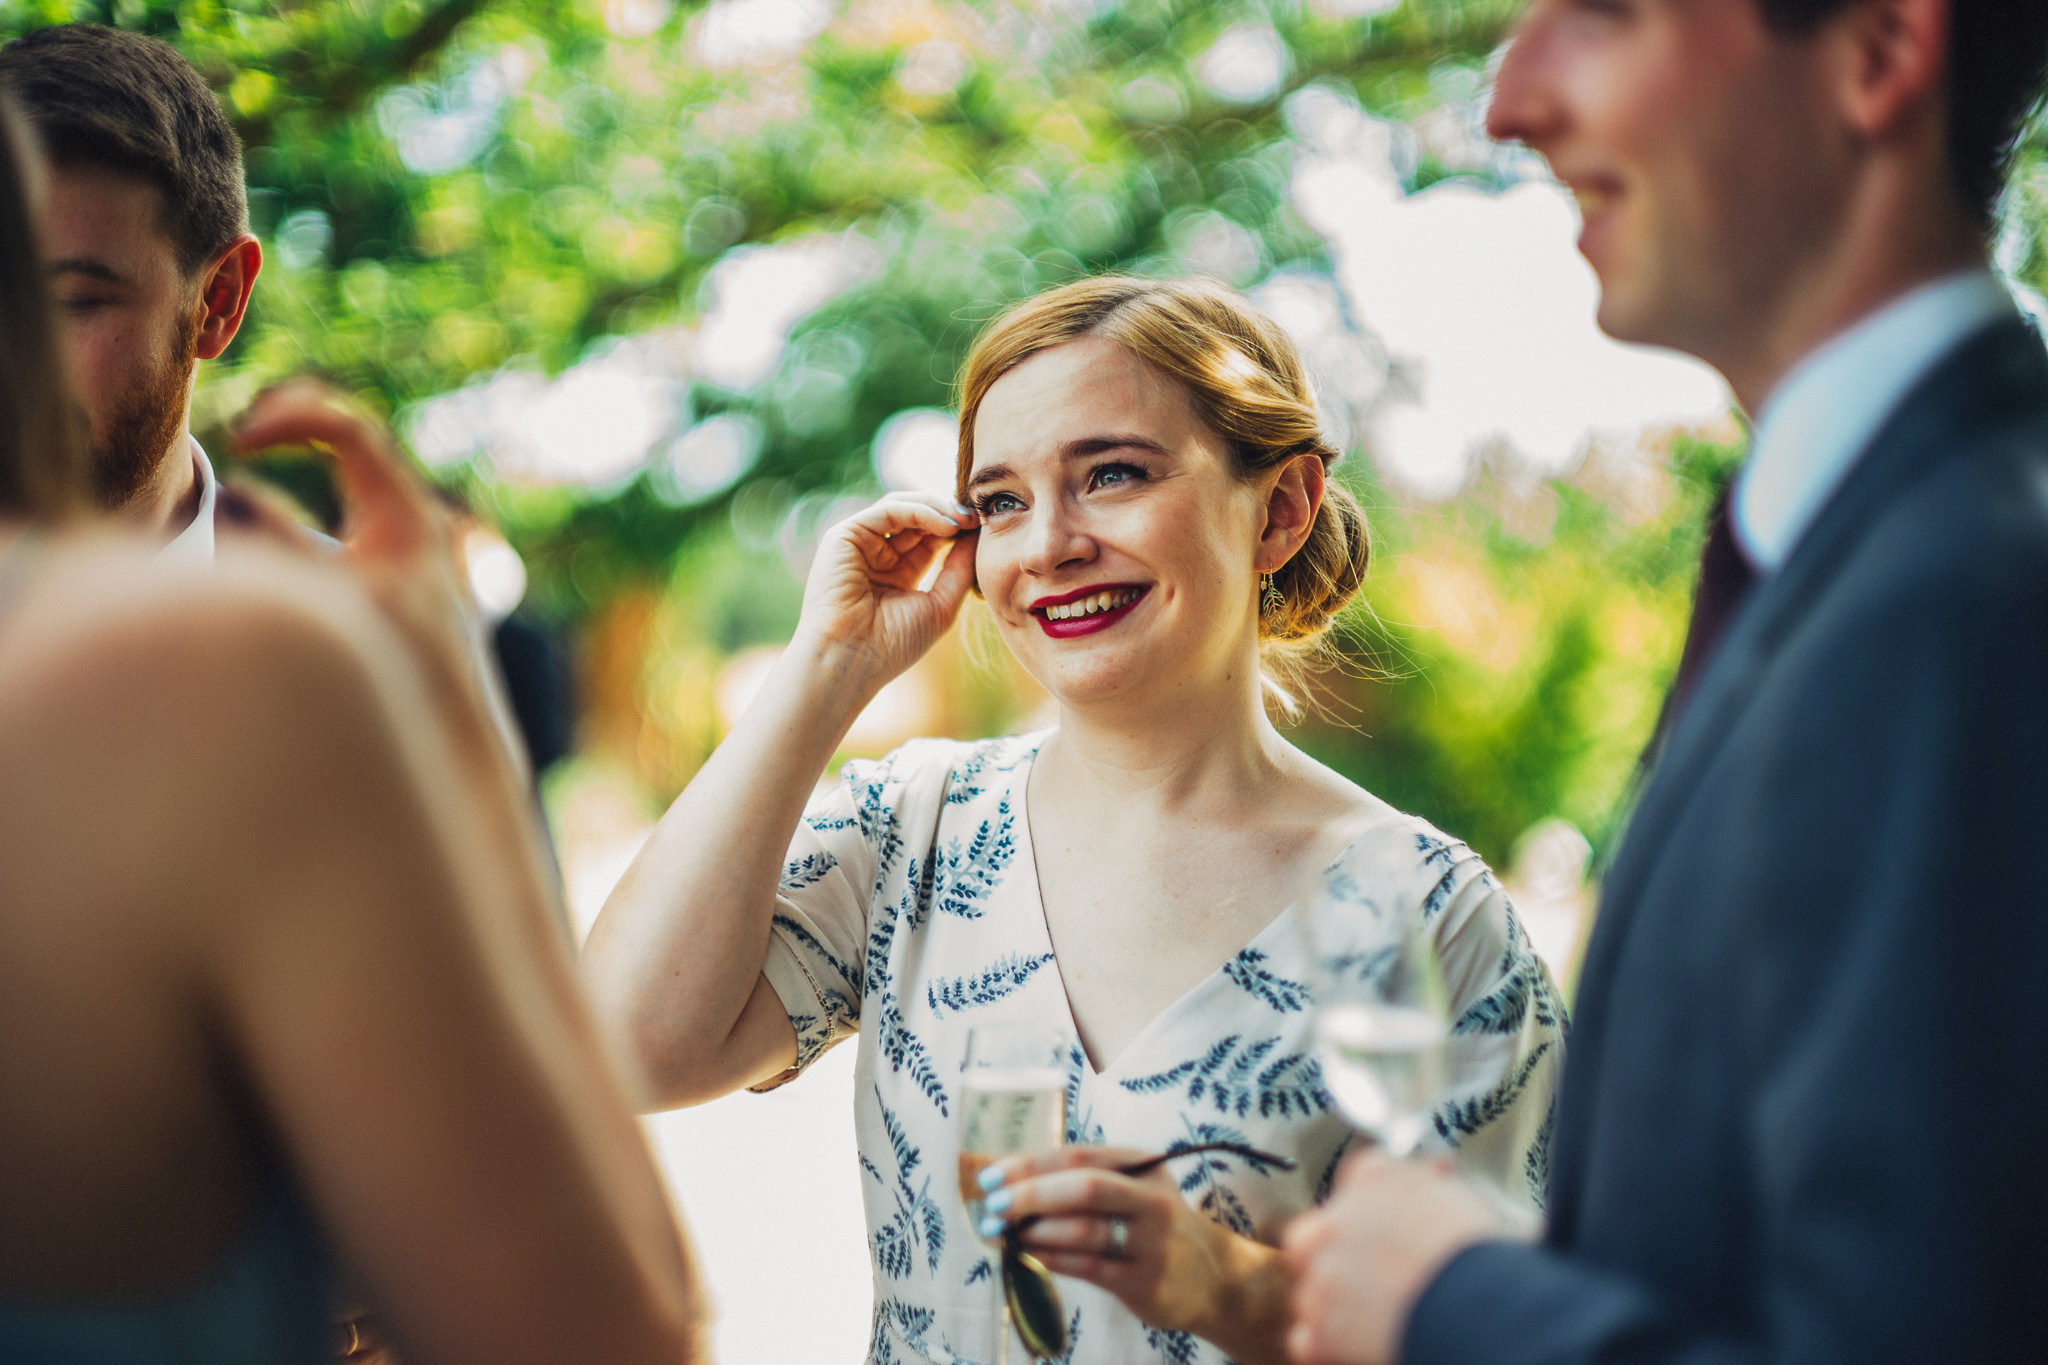 paul-marbrook-Gaynes-Park Wedding-Photographer-90092